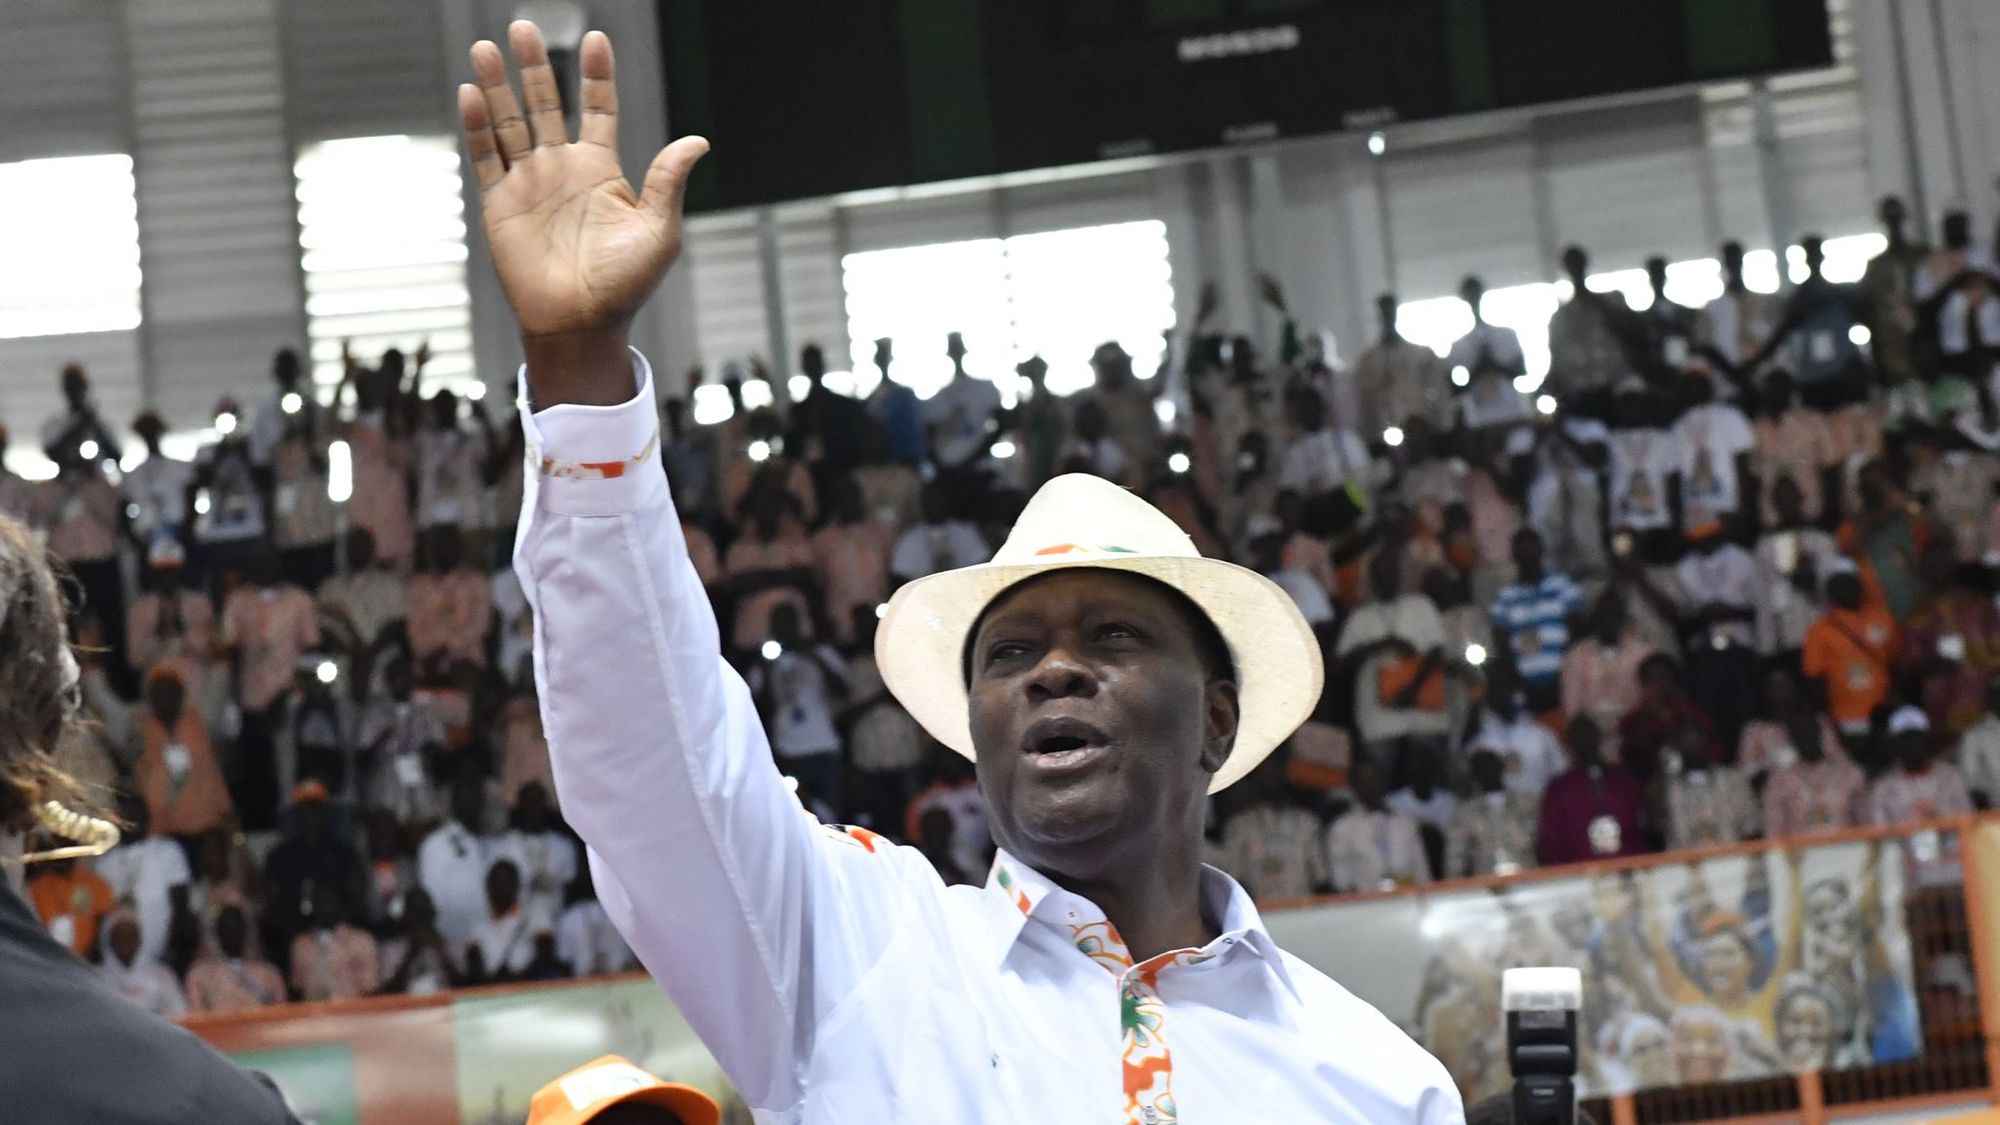 le-president-ivoirien-alassane-ouattara-lors-du-congres-de-son-parti-le-10-septembre-2017-a-abidjan